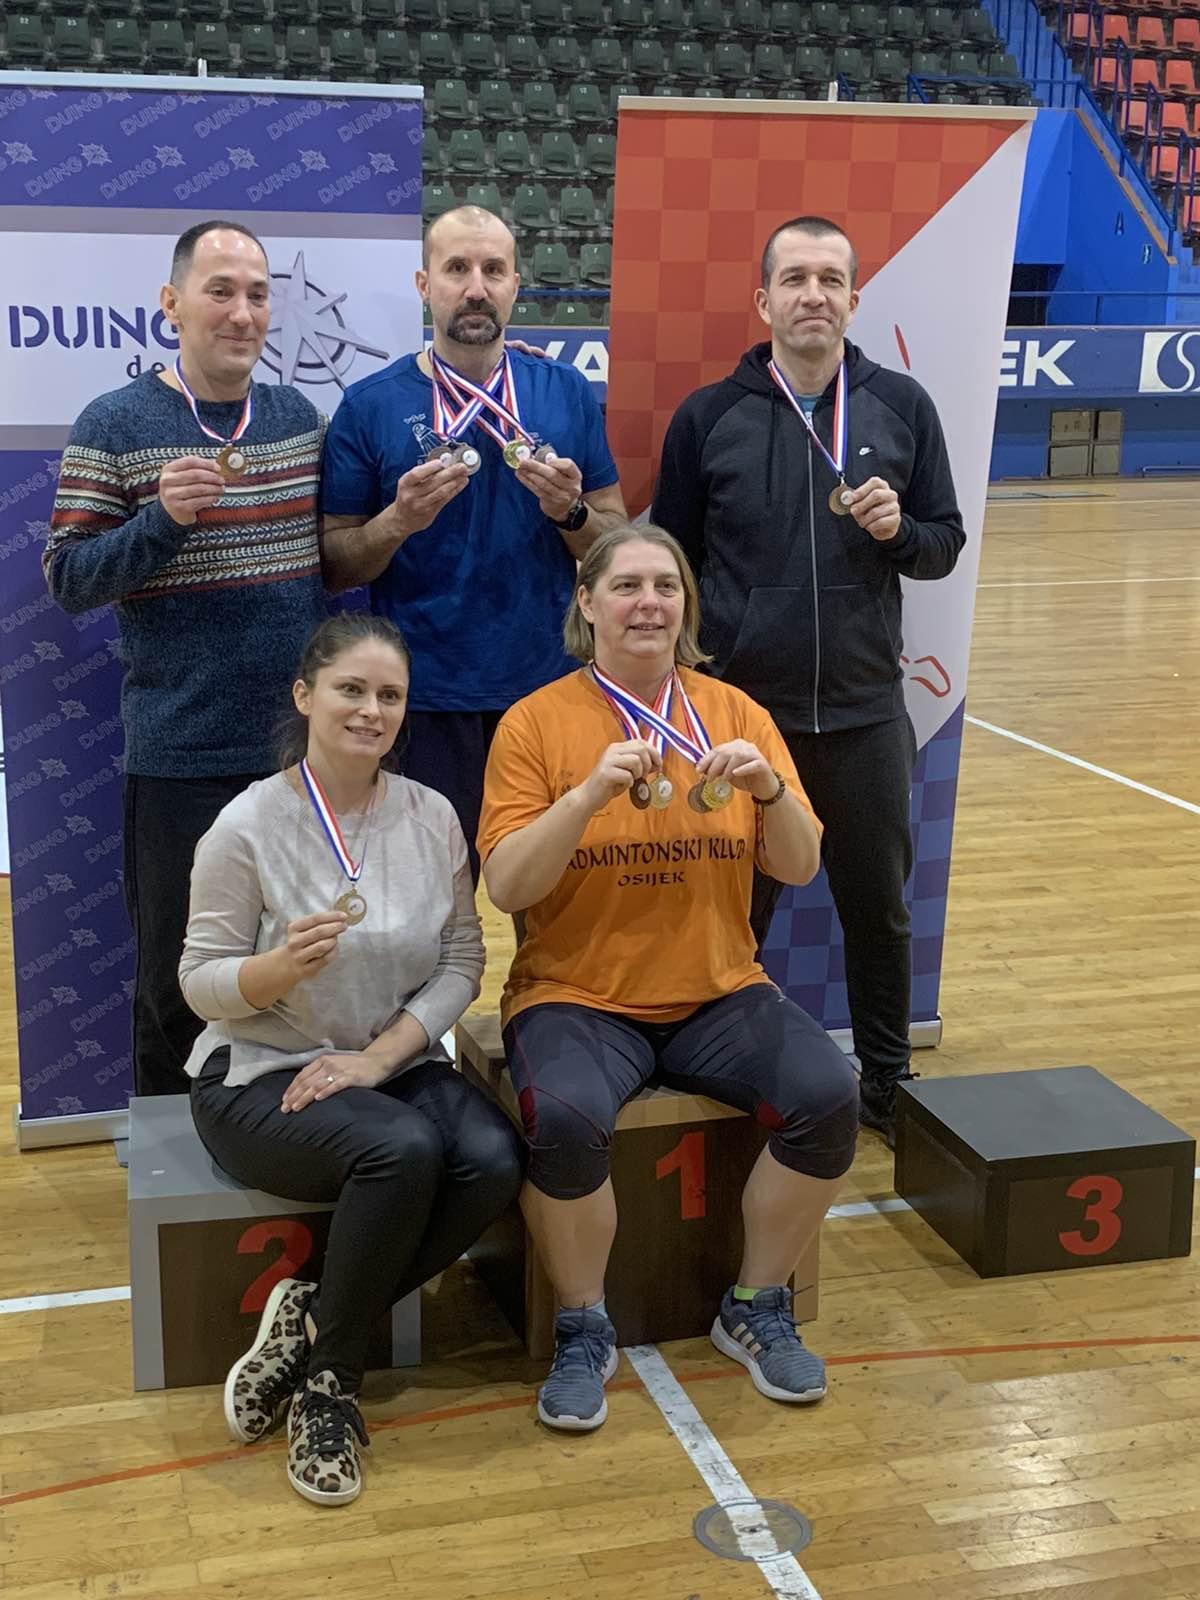 BK Osijek - veterani